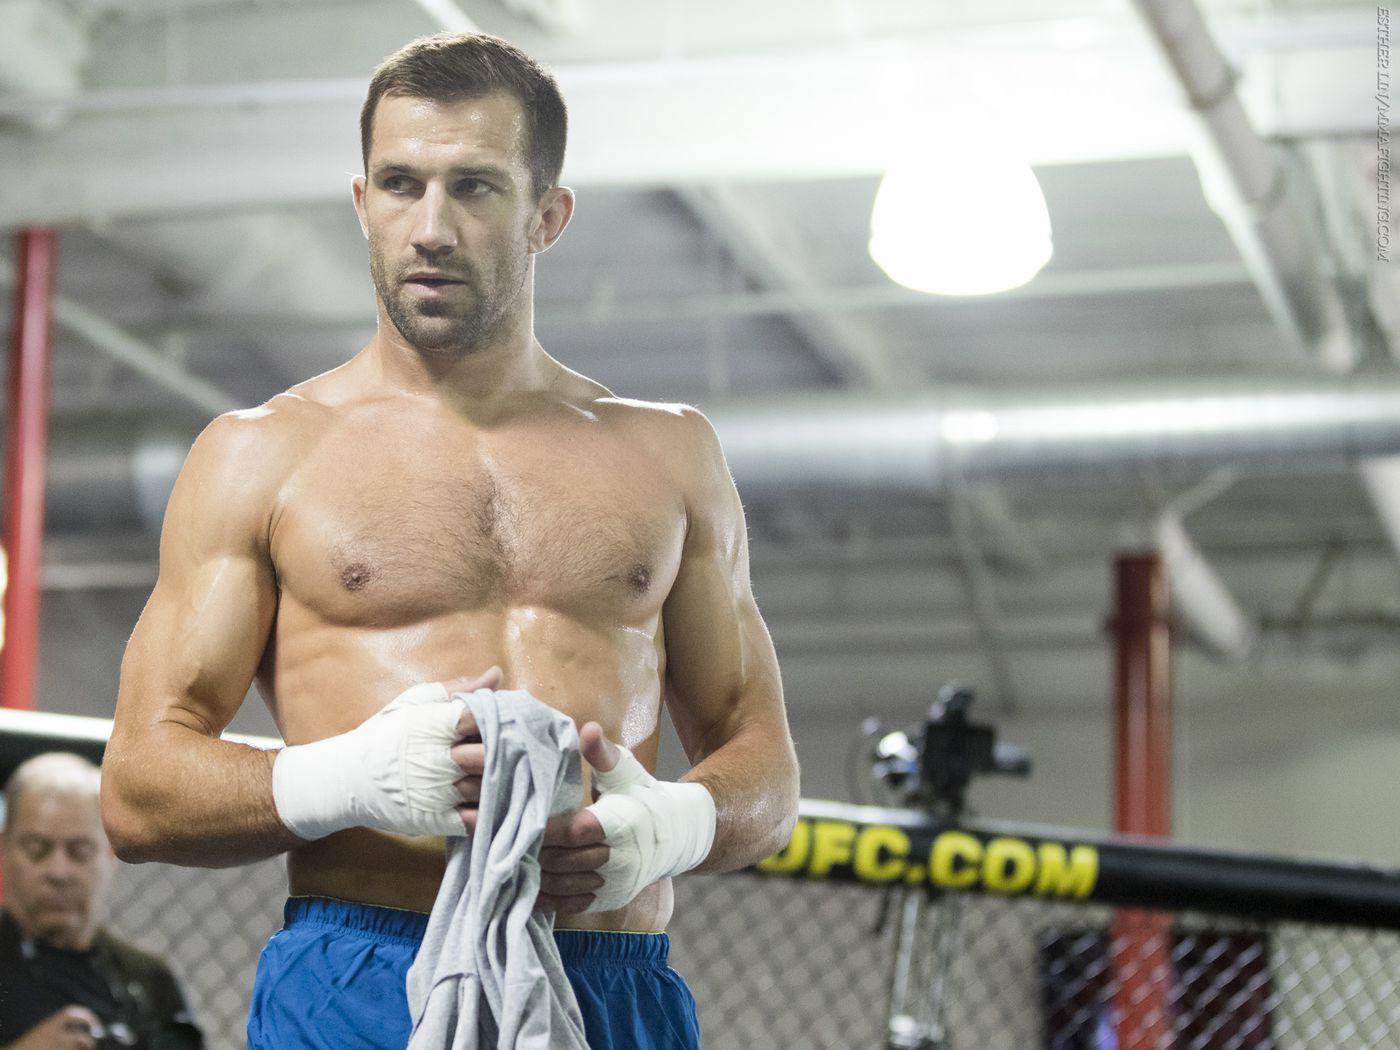 Luke Rockhold looking to go 'straight through' to Jon Jones with win at UFC 239 - MMA Fighting